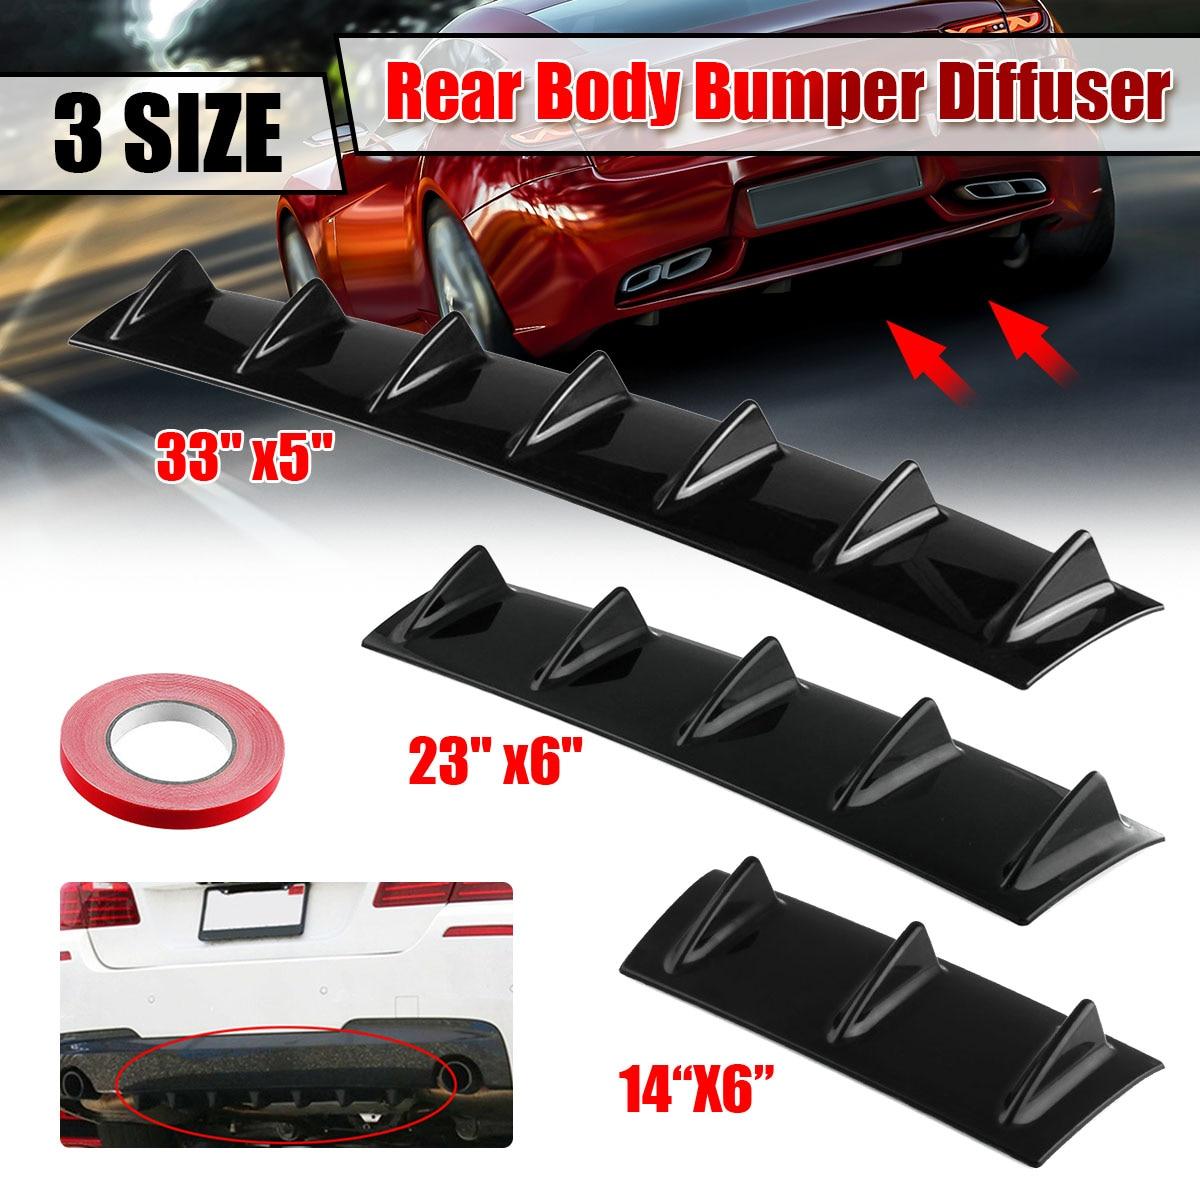 Gloss Preto Universal Car Rear Bumper Difusor Splitter Tubarão 3 5 7Fin Kit Rear Bumper Lip Spoiler Para Honda Para toyota Para Benz